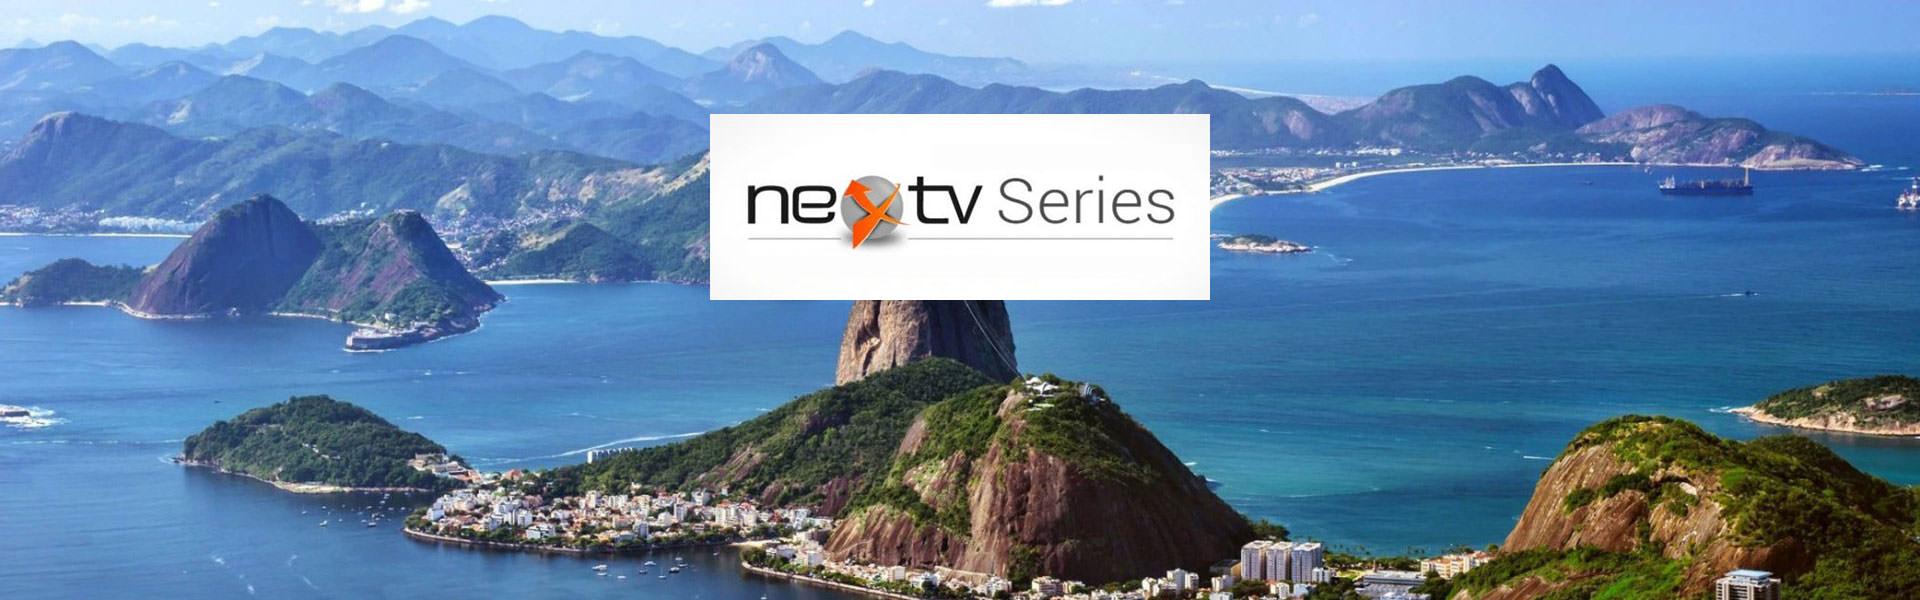 NextTV Brazil event logo